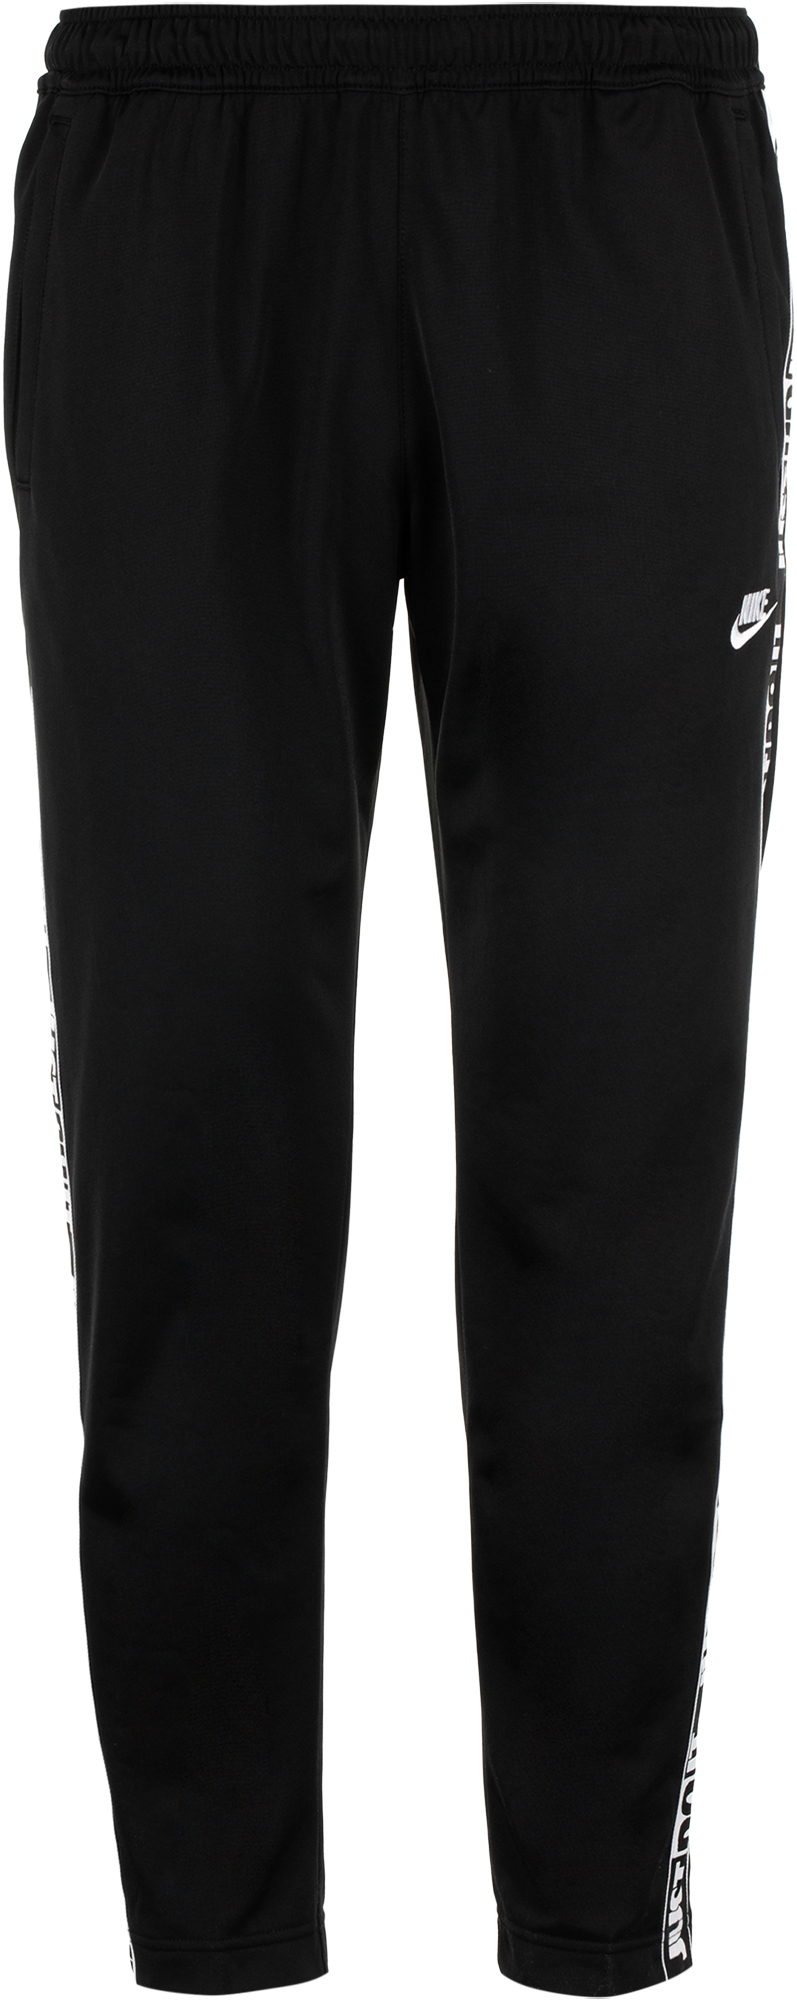 Фото - Nike Брюки мужские Nike Sportswear JDI, размер 52-54 nike свитшот мужской nike sportswear just do it размер 52 54